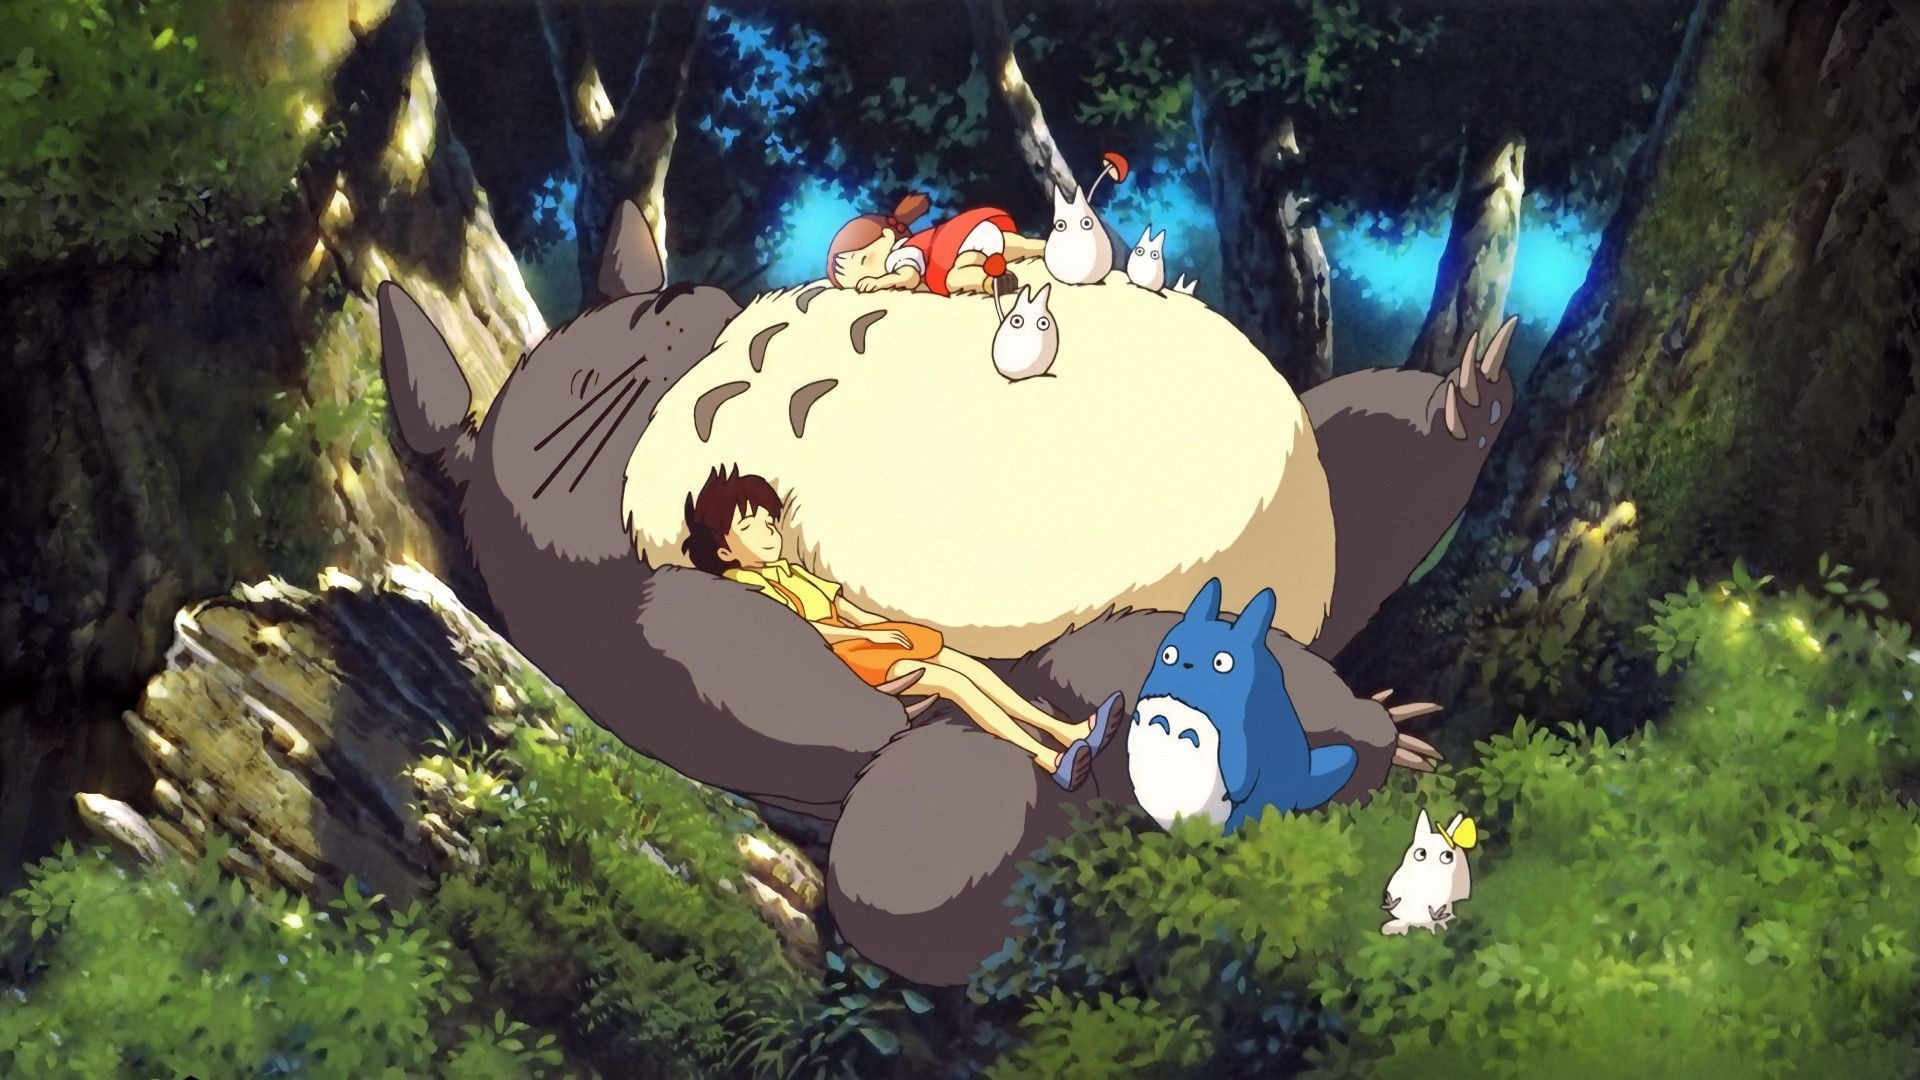 My Neighbor Totoro Wallpapers HD Download 1920×1080 Totoro Wallpaper (43  Wallpapers) |